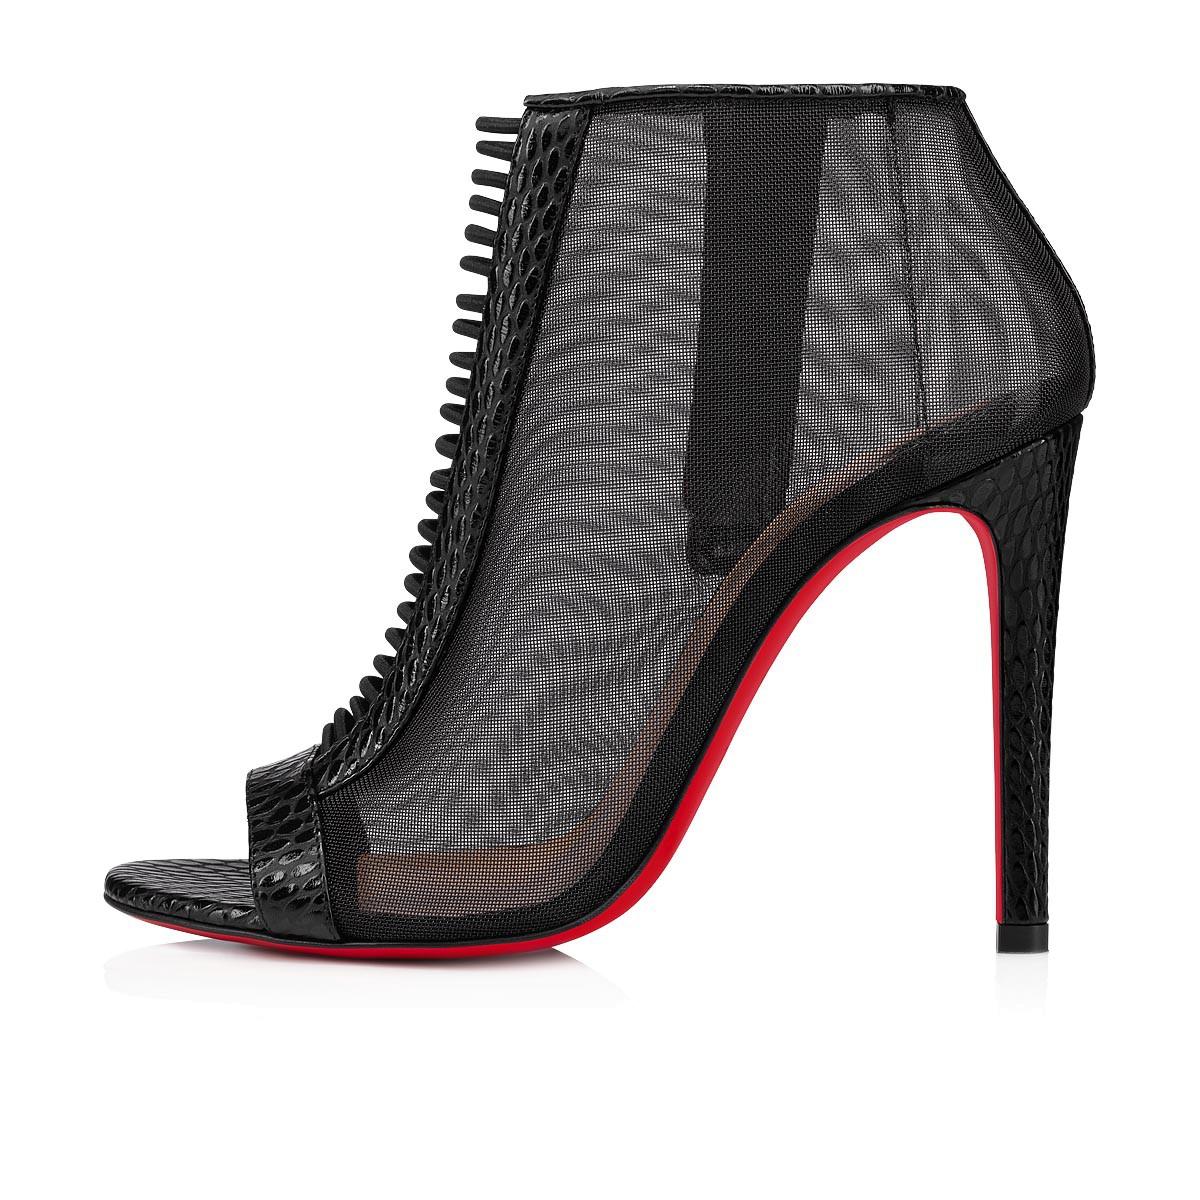 Shoes - Trouble - Christian Louboutin